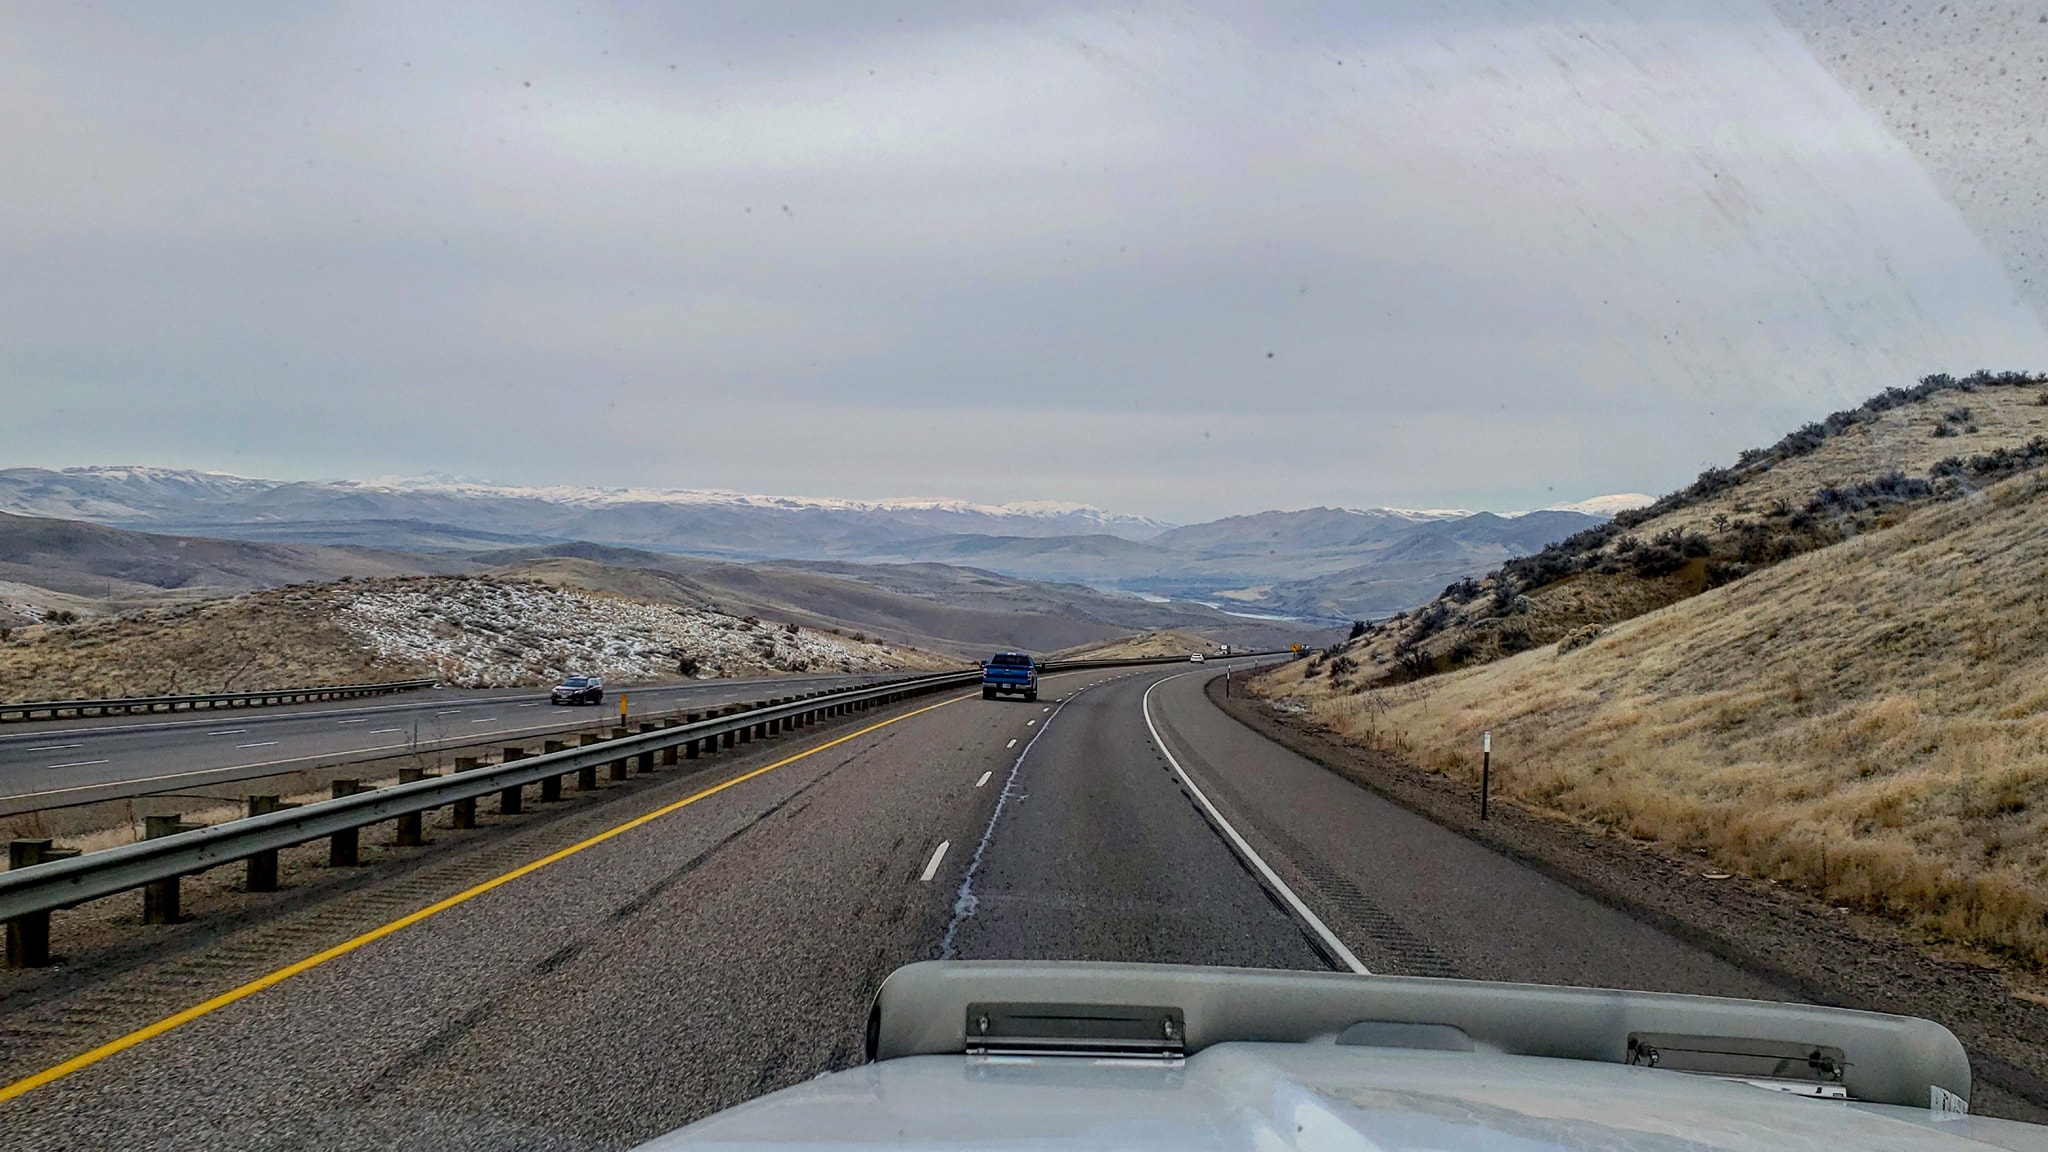 6-1-2019-rondreis-van-2800-km-Montana-Idaho-Oregon-Washington-(20)